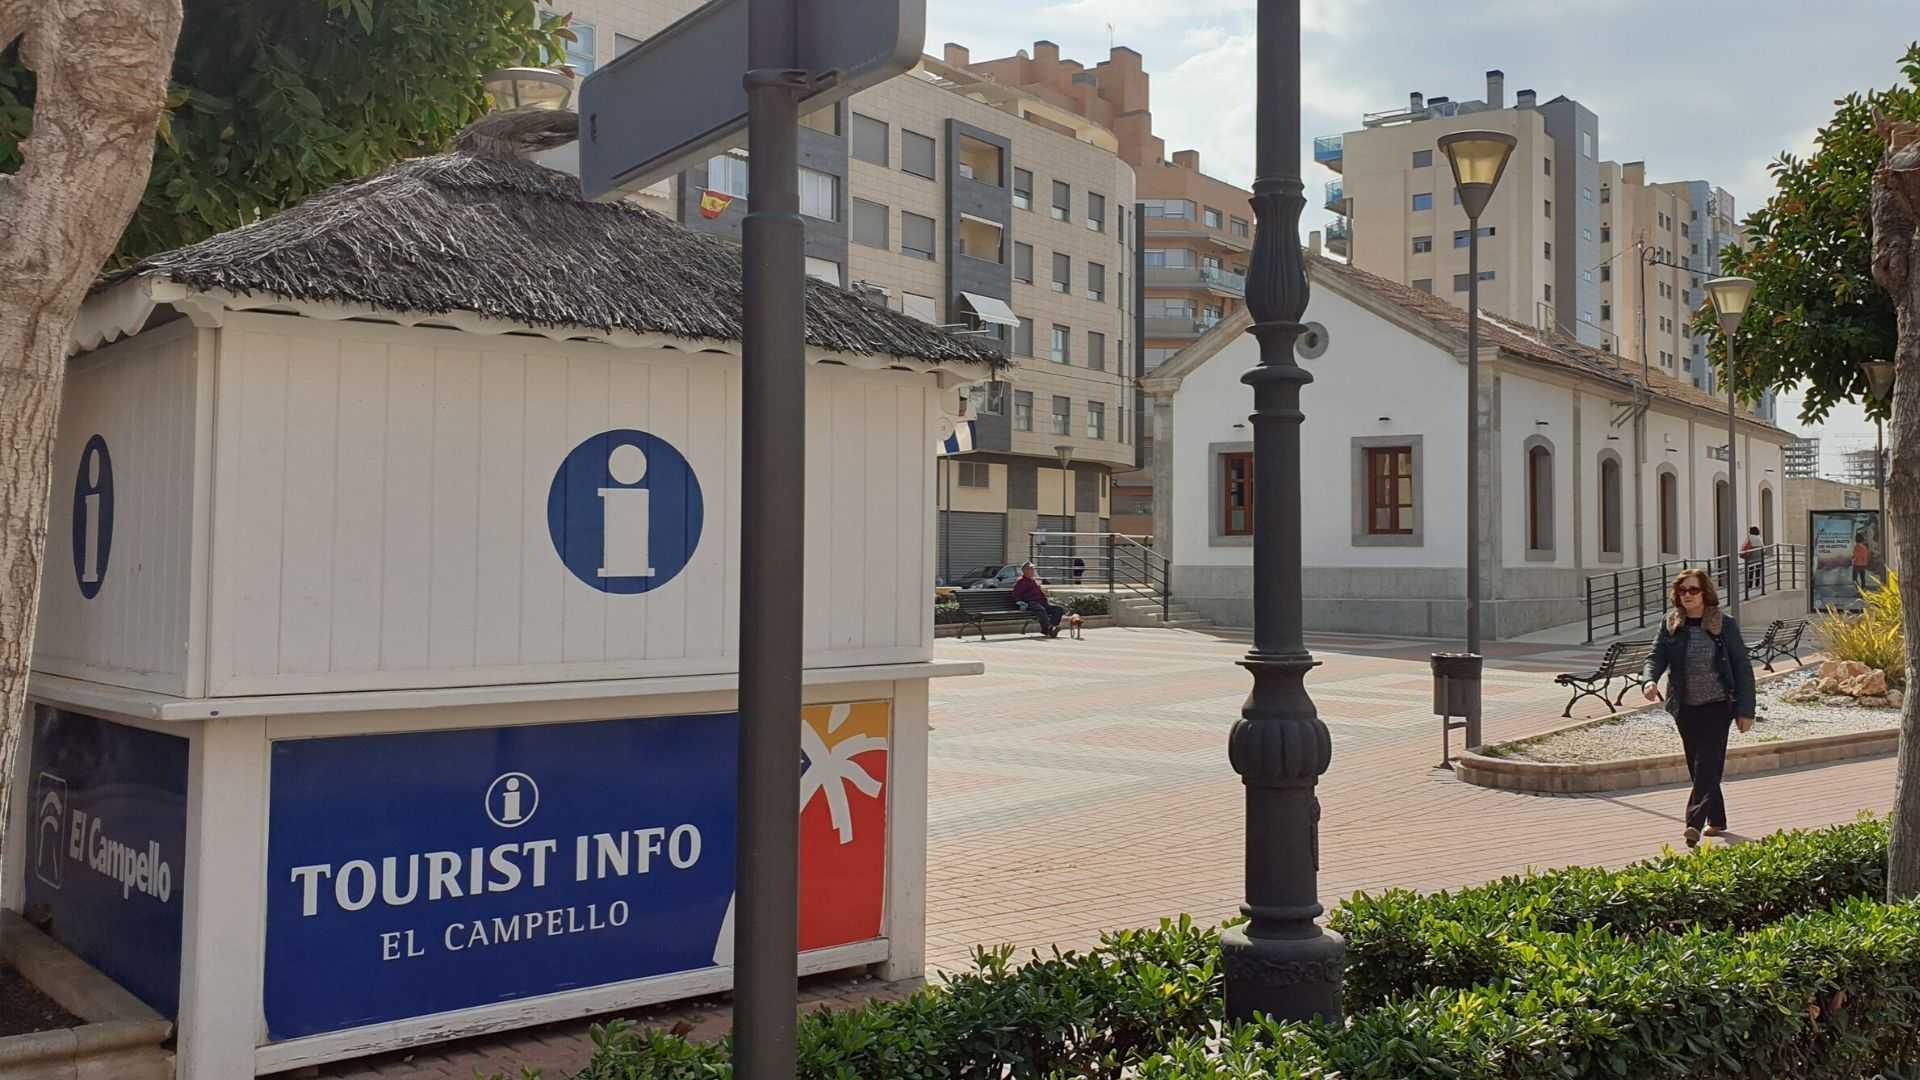 TOURIST INFO EL CAMPELLO - ESTACION FGV